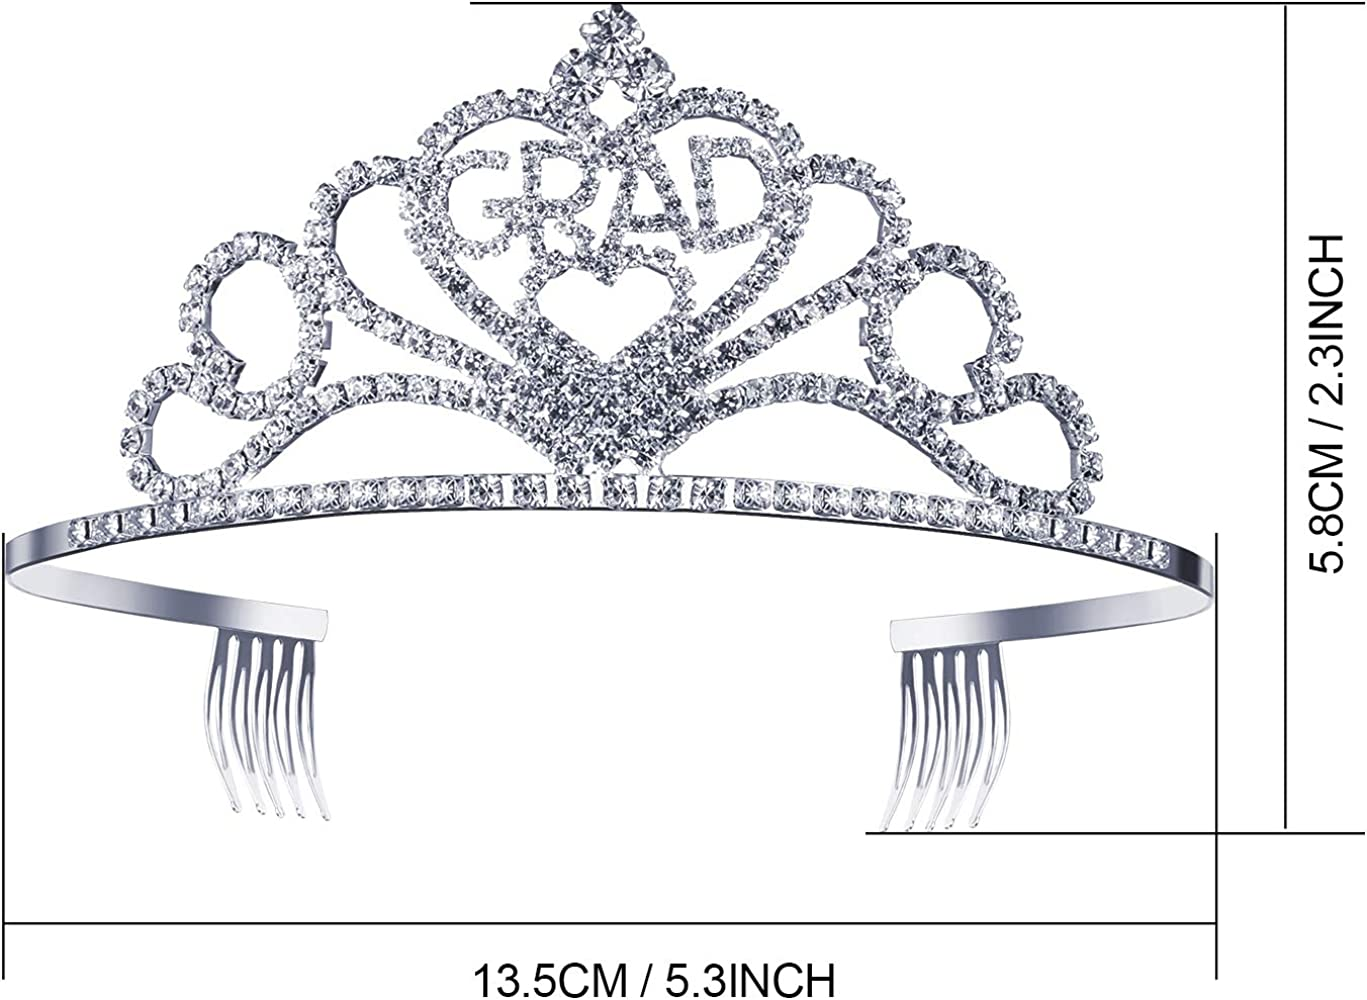 Black Glittered Metal Graduation Princess Grad Crown Tiara and Graduated Sash 2020 Graduation Party Supplies Kits Great Gifts for Graduation Party Decorations Grad Decor Favors